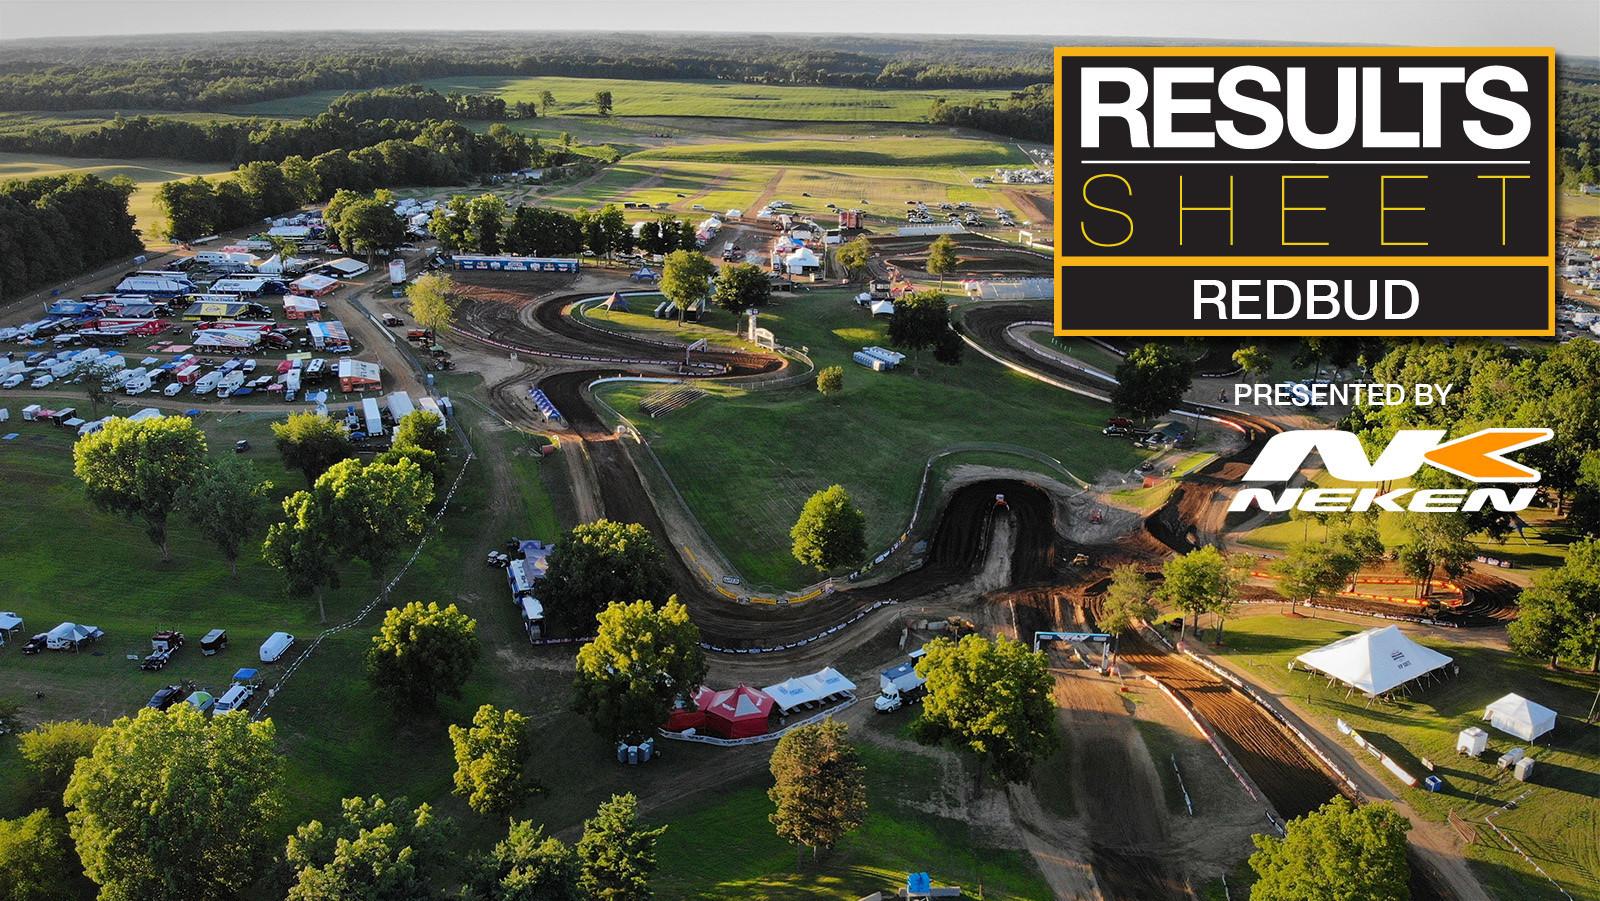 Results Sheet: 2018 RedBud Motocross National